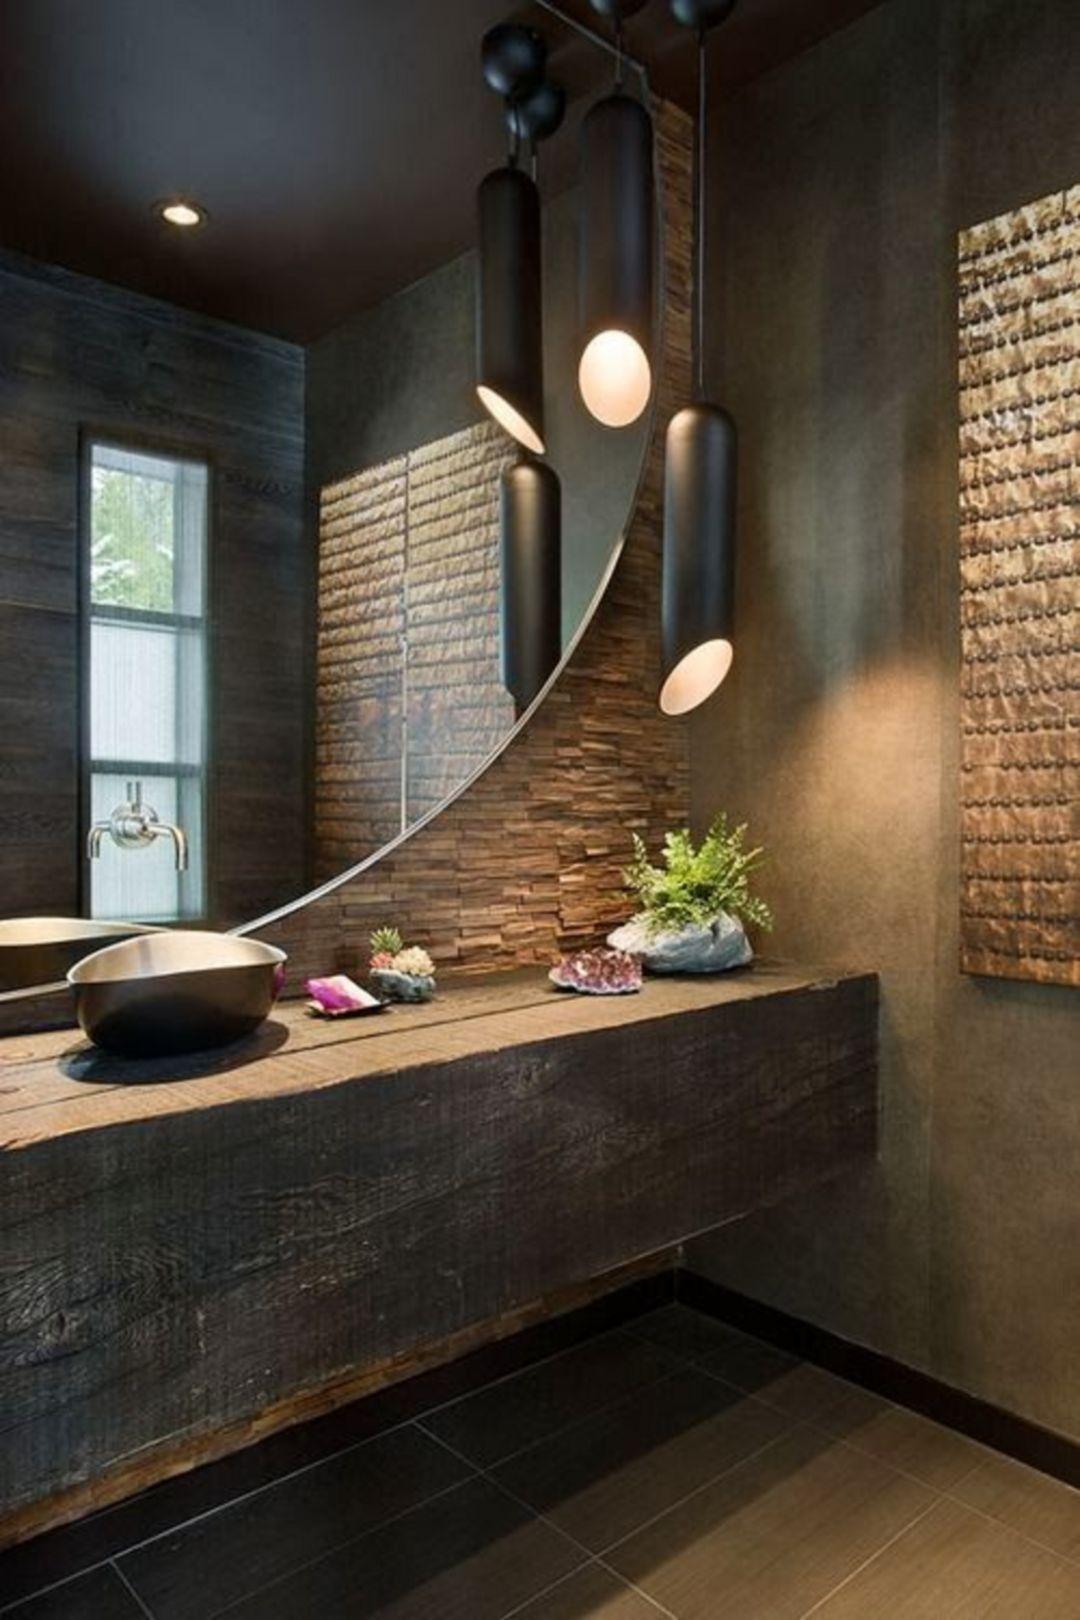 20 Amazing Industrial Bathroom Decorating Ideas For Your Inspiration Modern Bathroom Decor Spa Bathroom Design Modern Bathroom